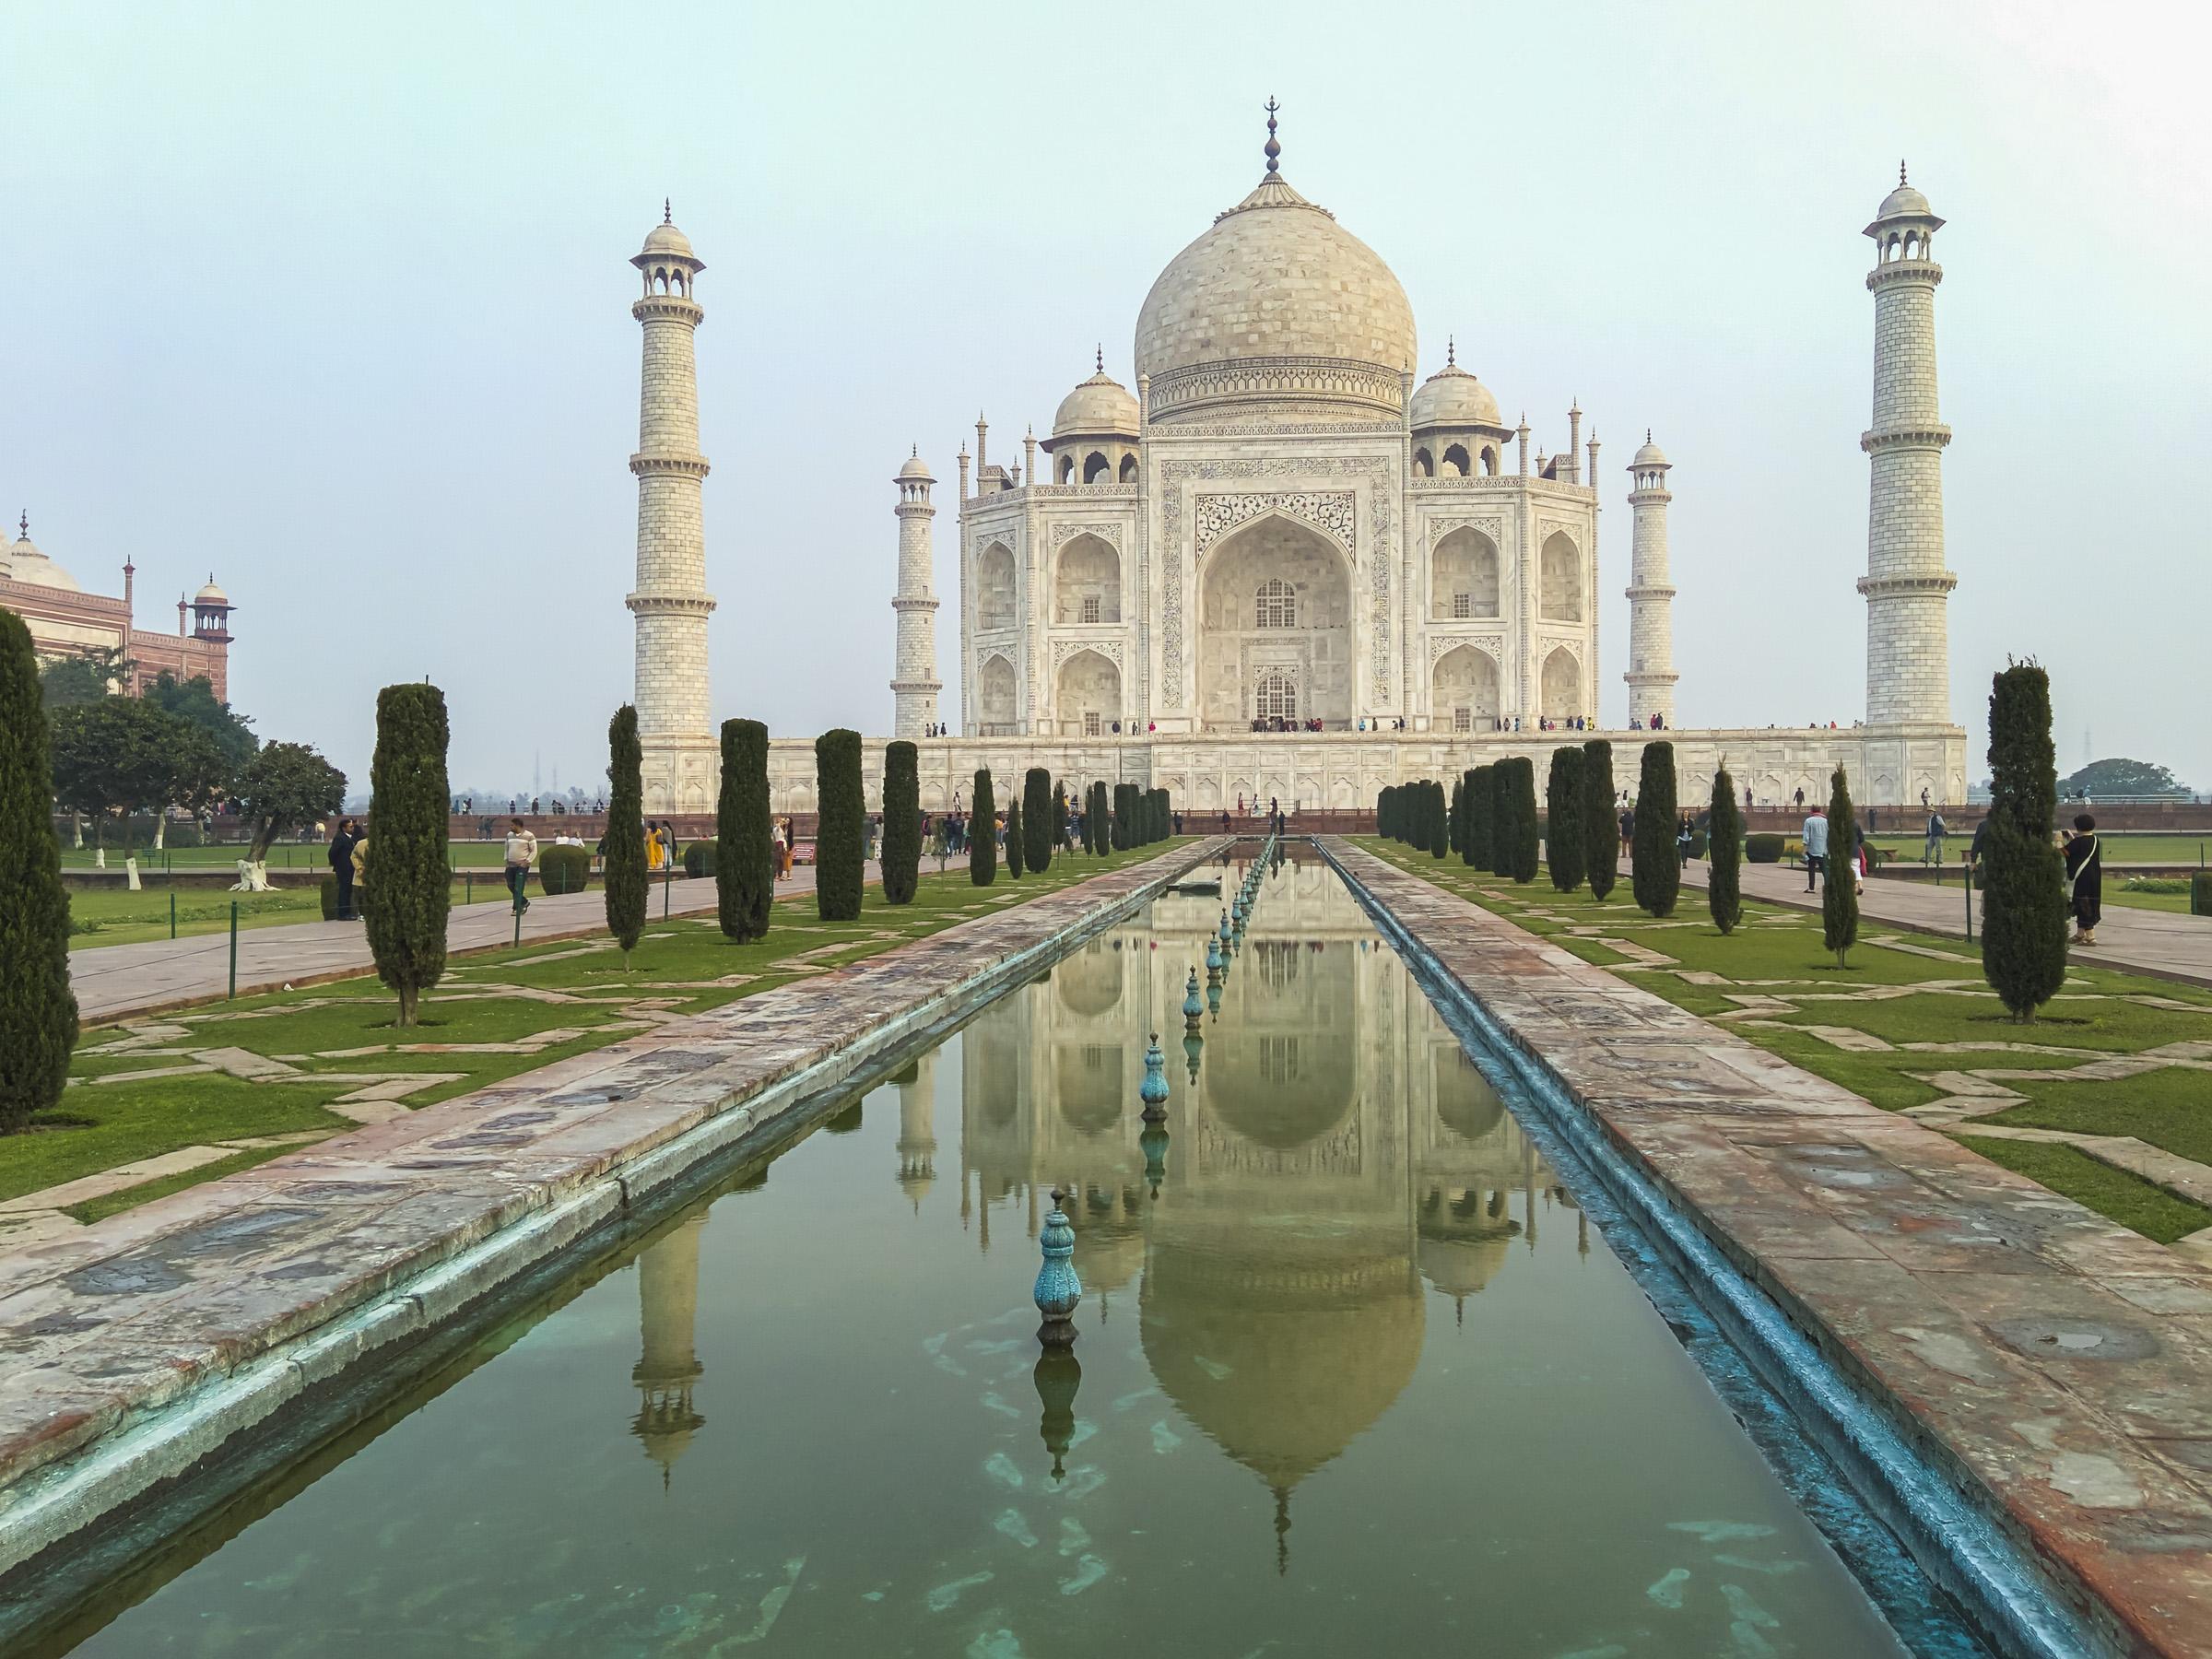 India2018_027_L16_00397.jpg